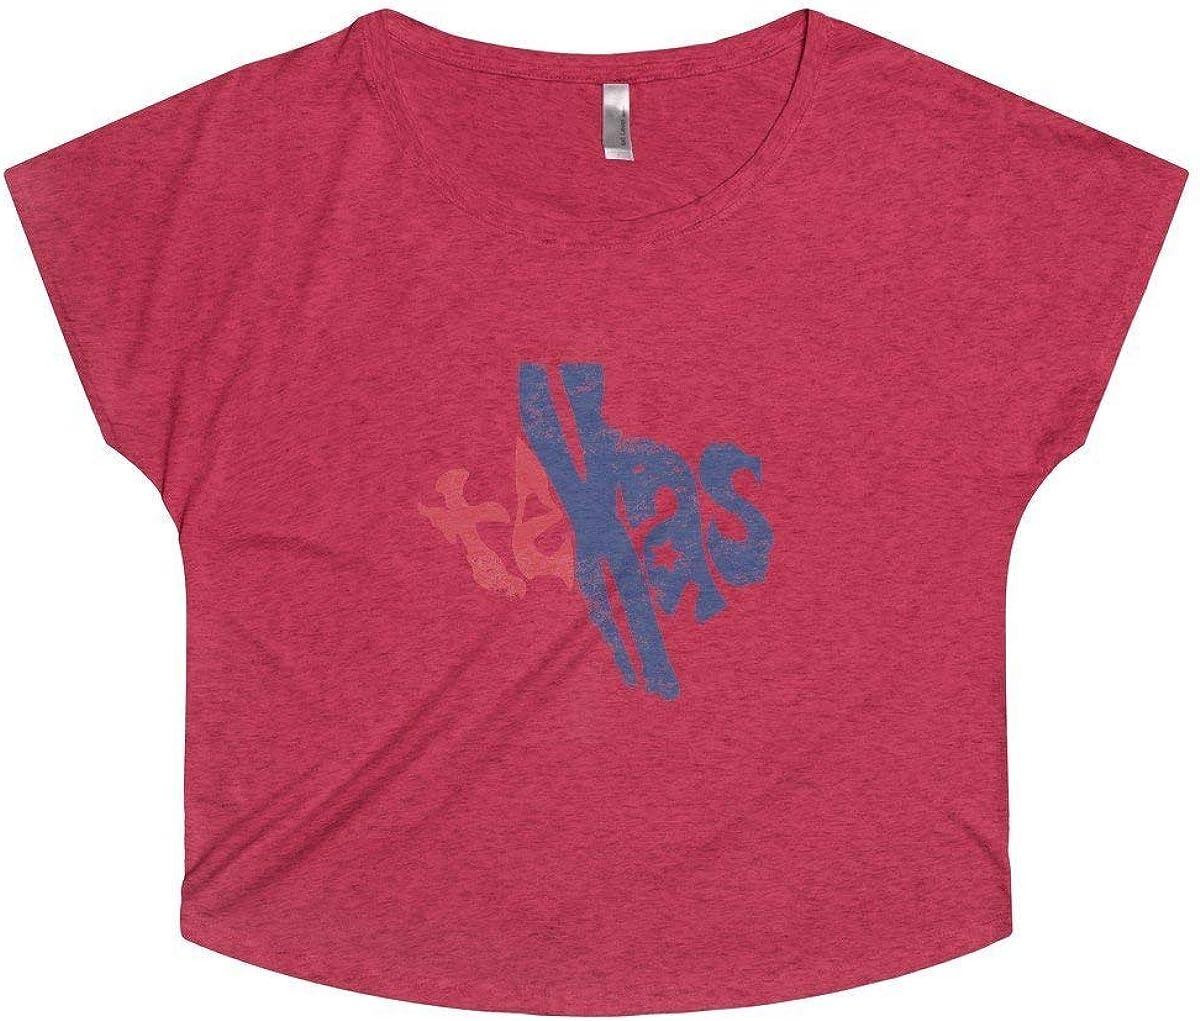 Texas State Red White /& Blue Womens Tri-Blend Dolman Tee